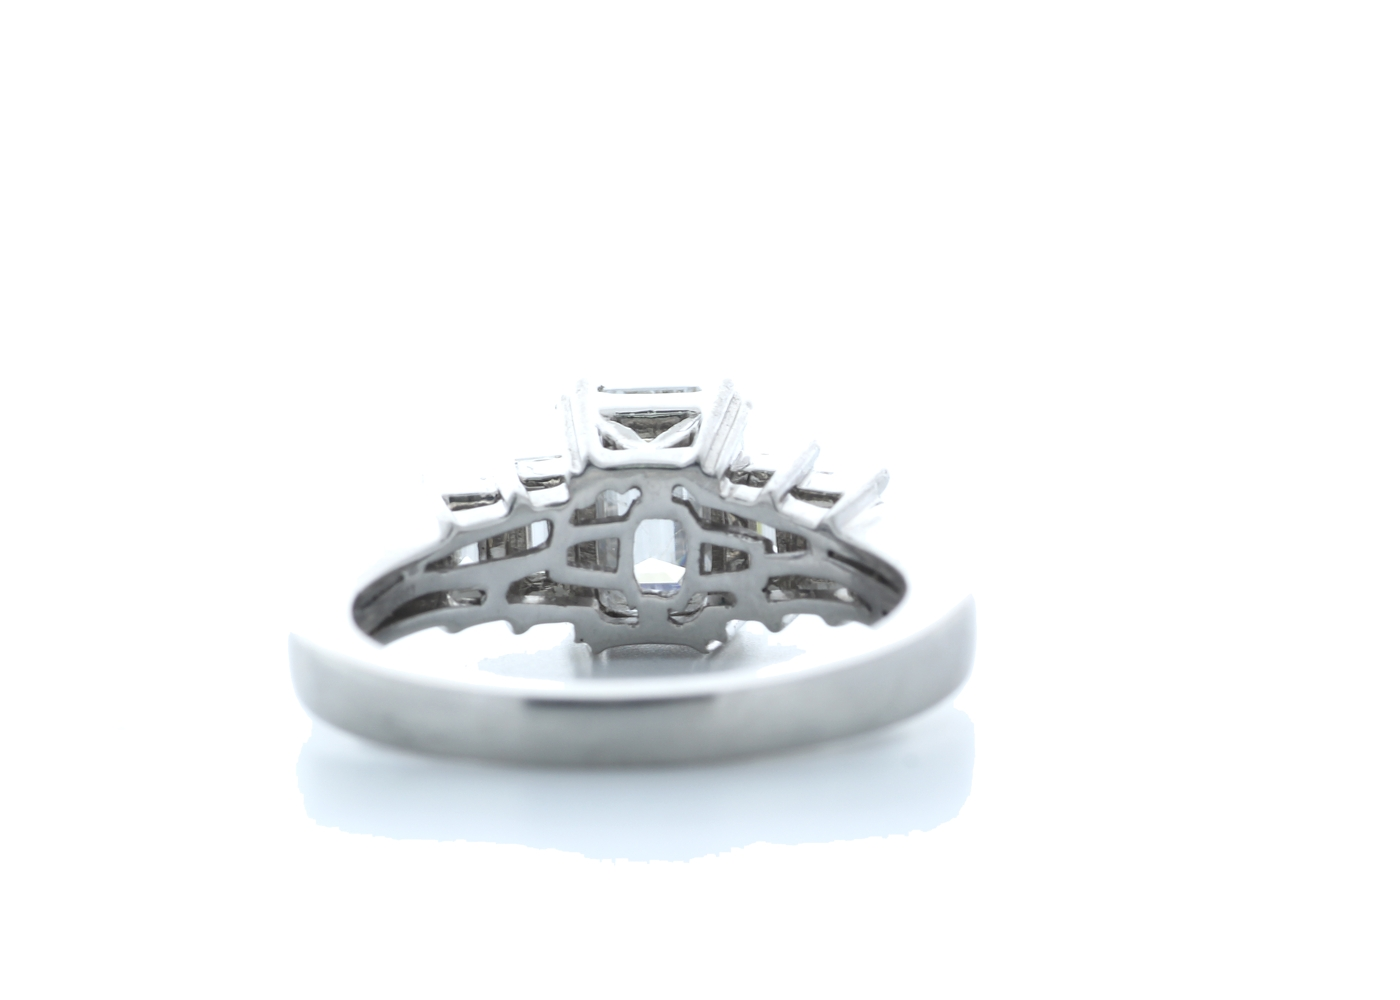 18ct White Gold Emerald Cut Diamond Ring 1.73 (1.23) Carats - Image 3 of 5